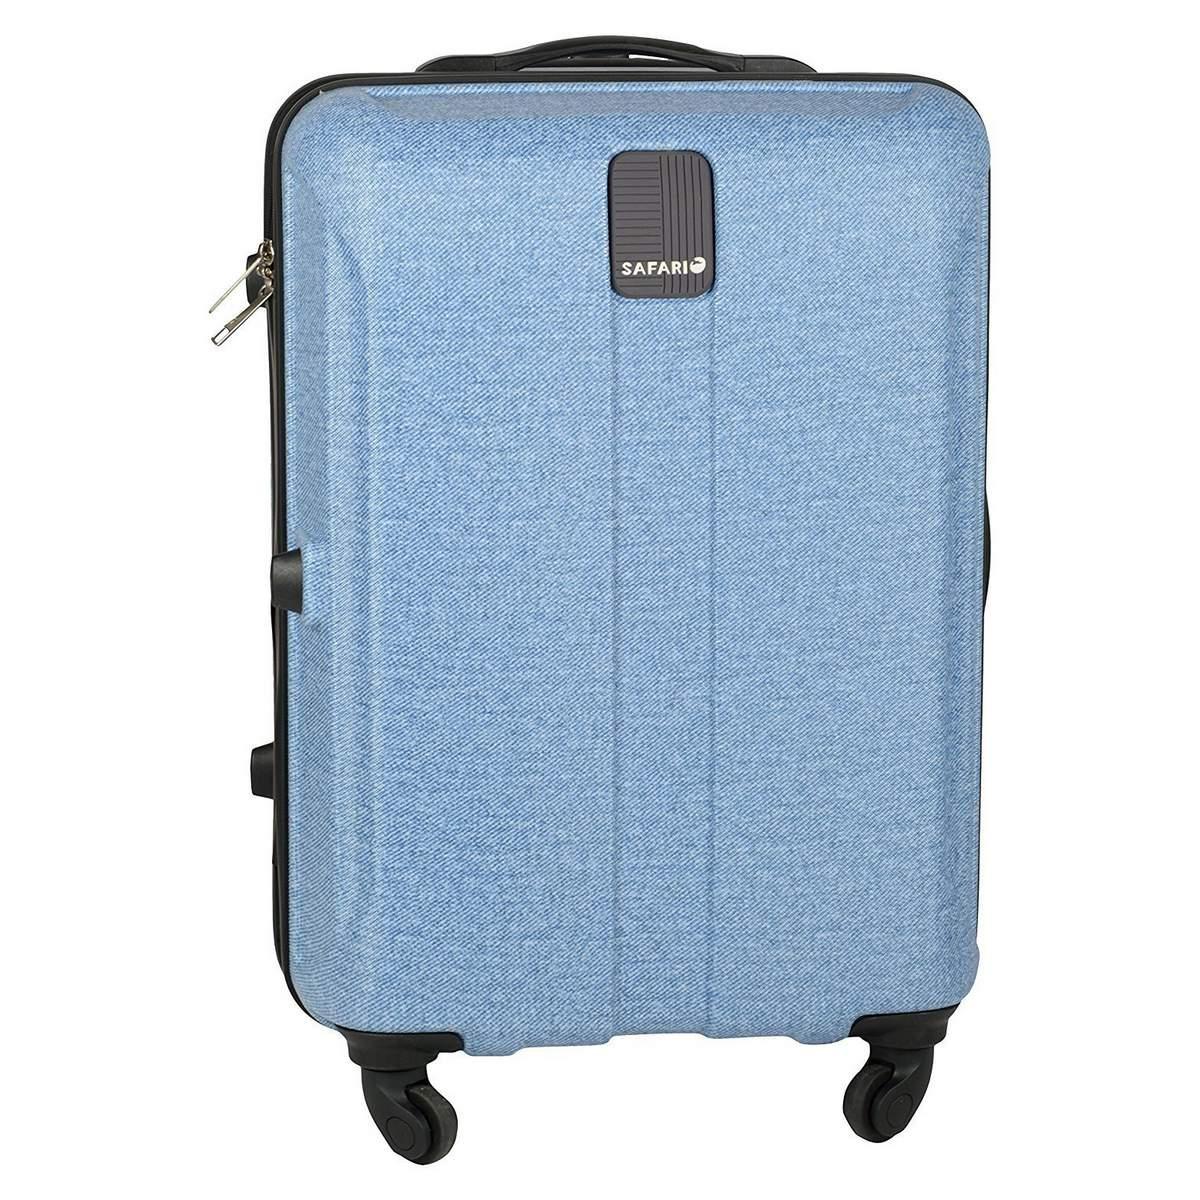 Safari Thorium Deluxe 55 Cm Cabin Size Hard Luggage Bag